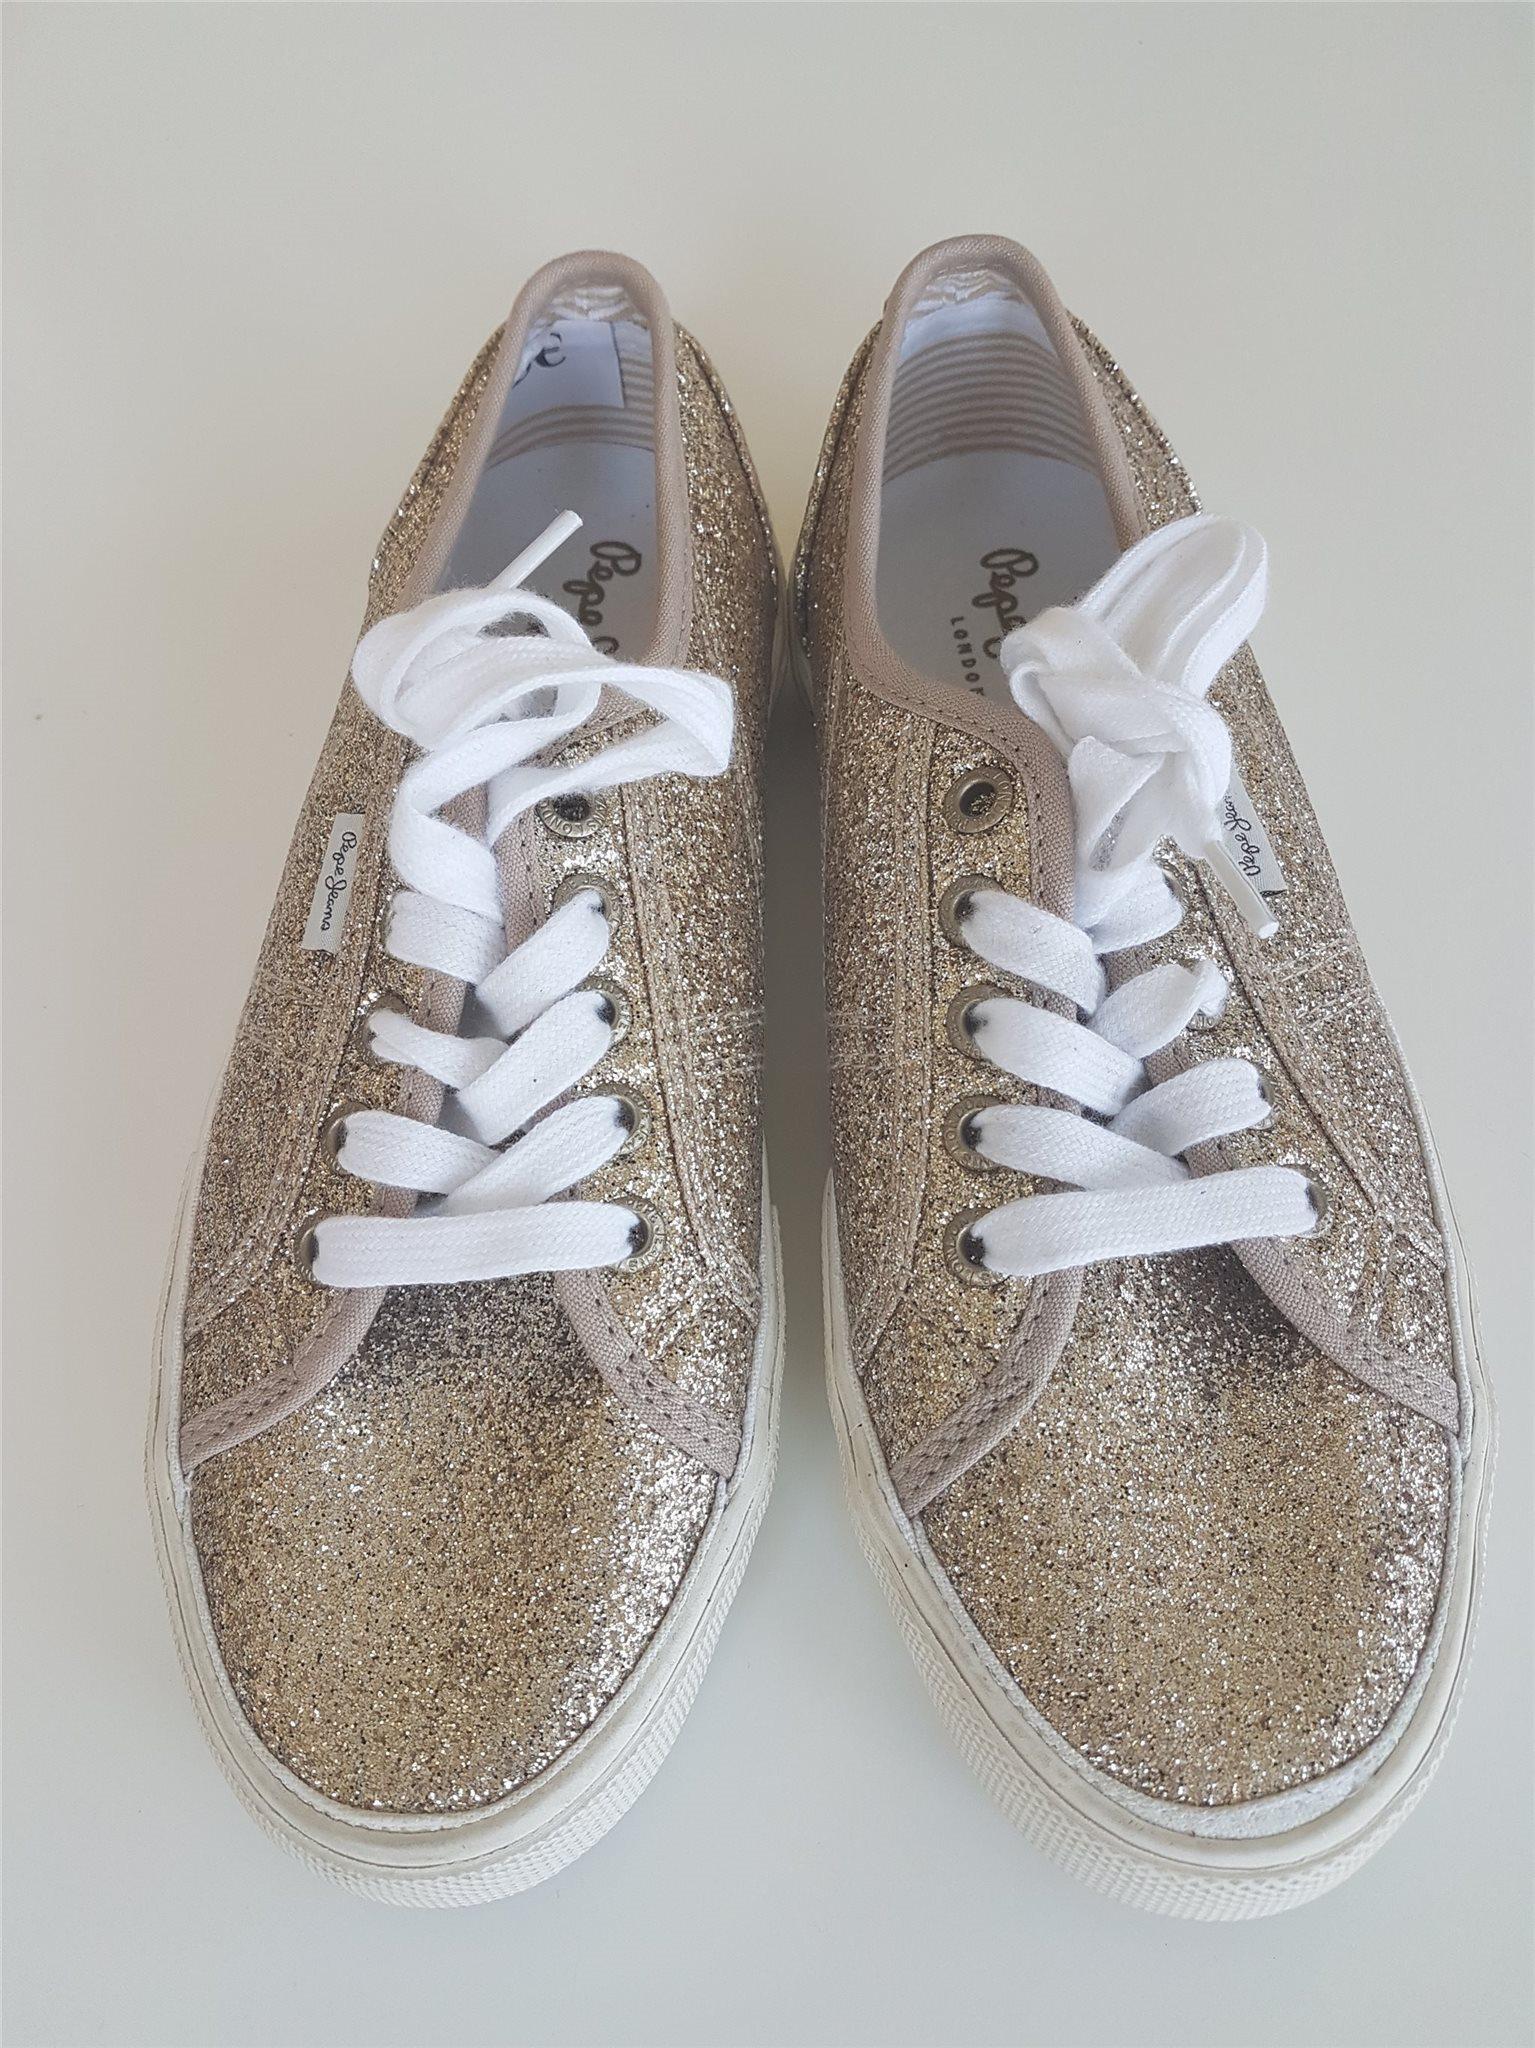 520cfcaf70f Pepe Jeans sneakers strl 37,5 guld glitter Nya .. (334648742) ᐈ Köp ...